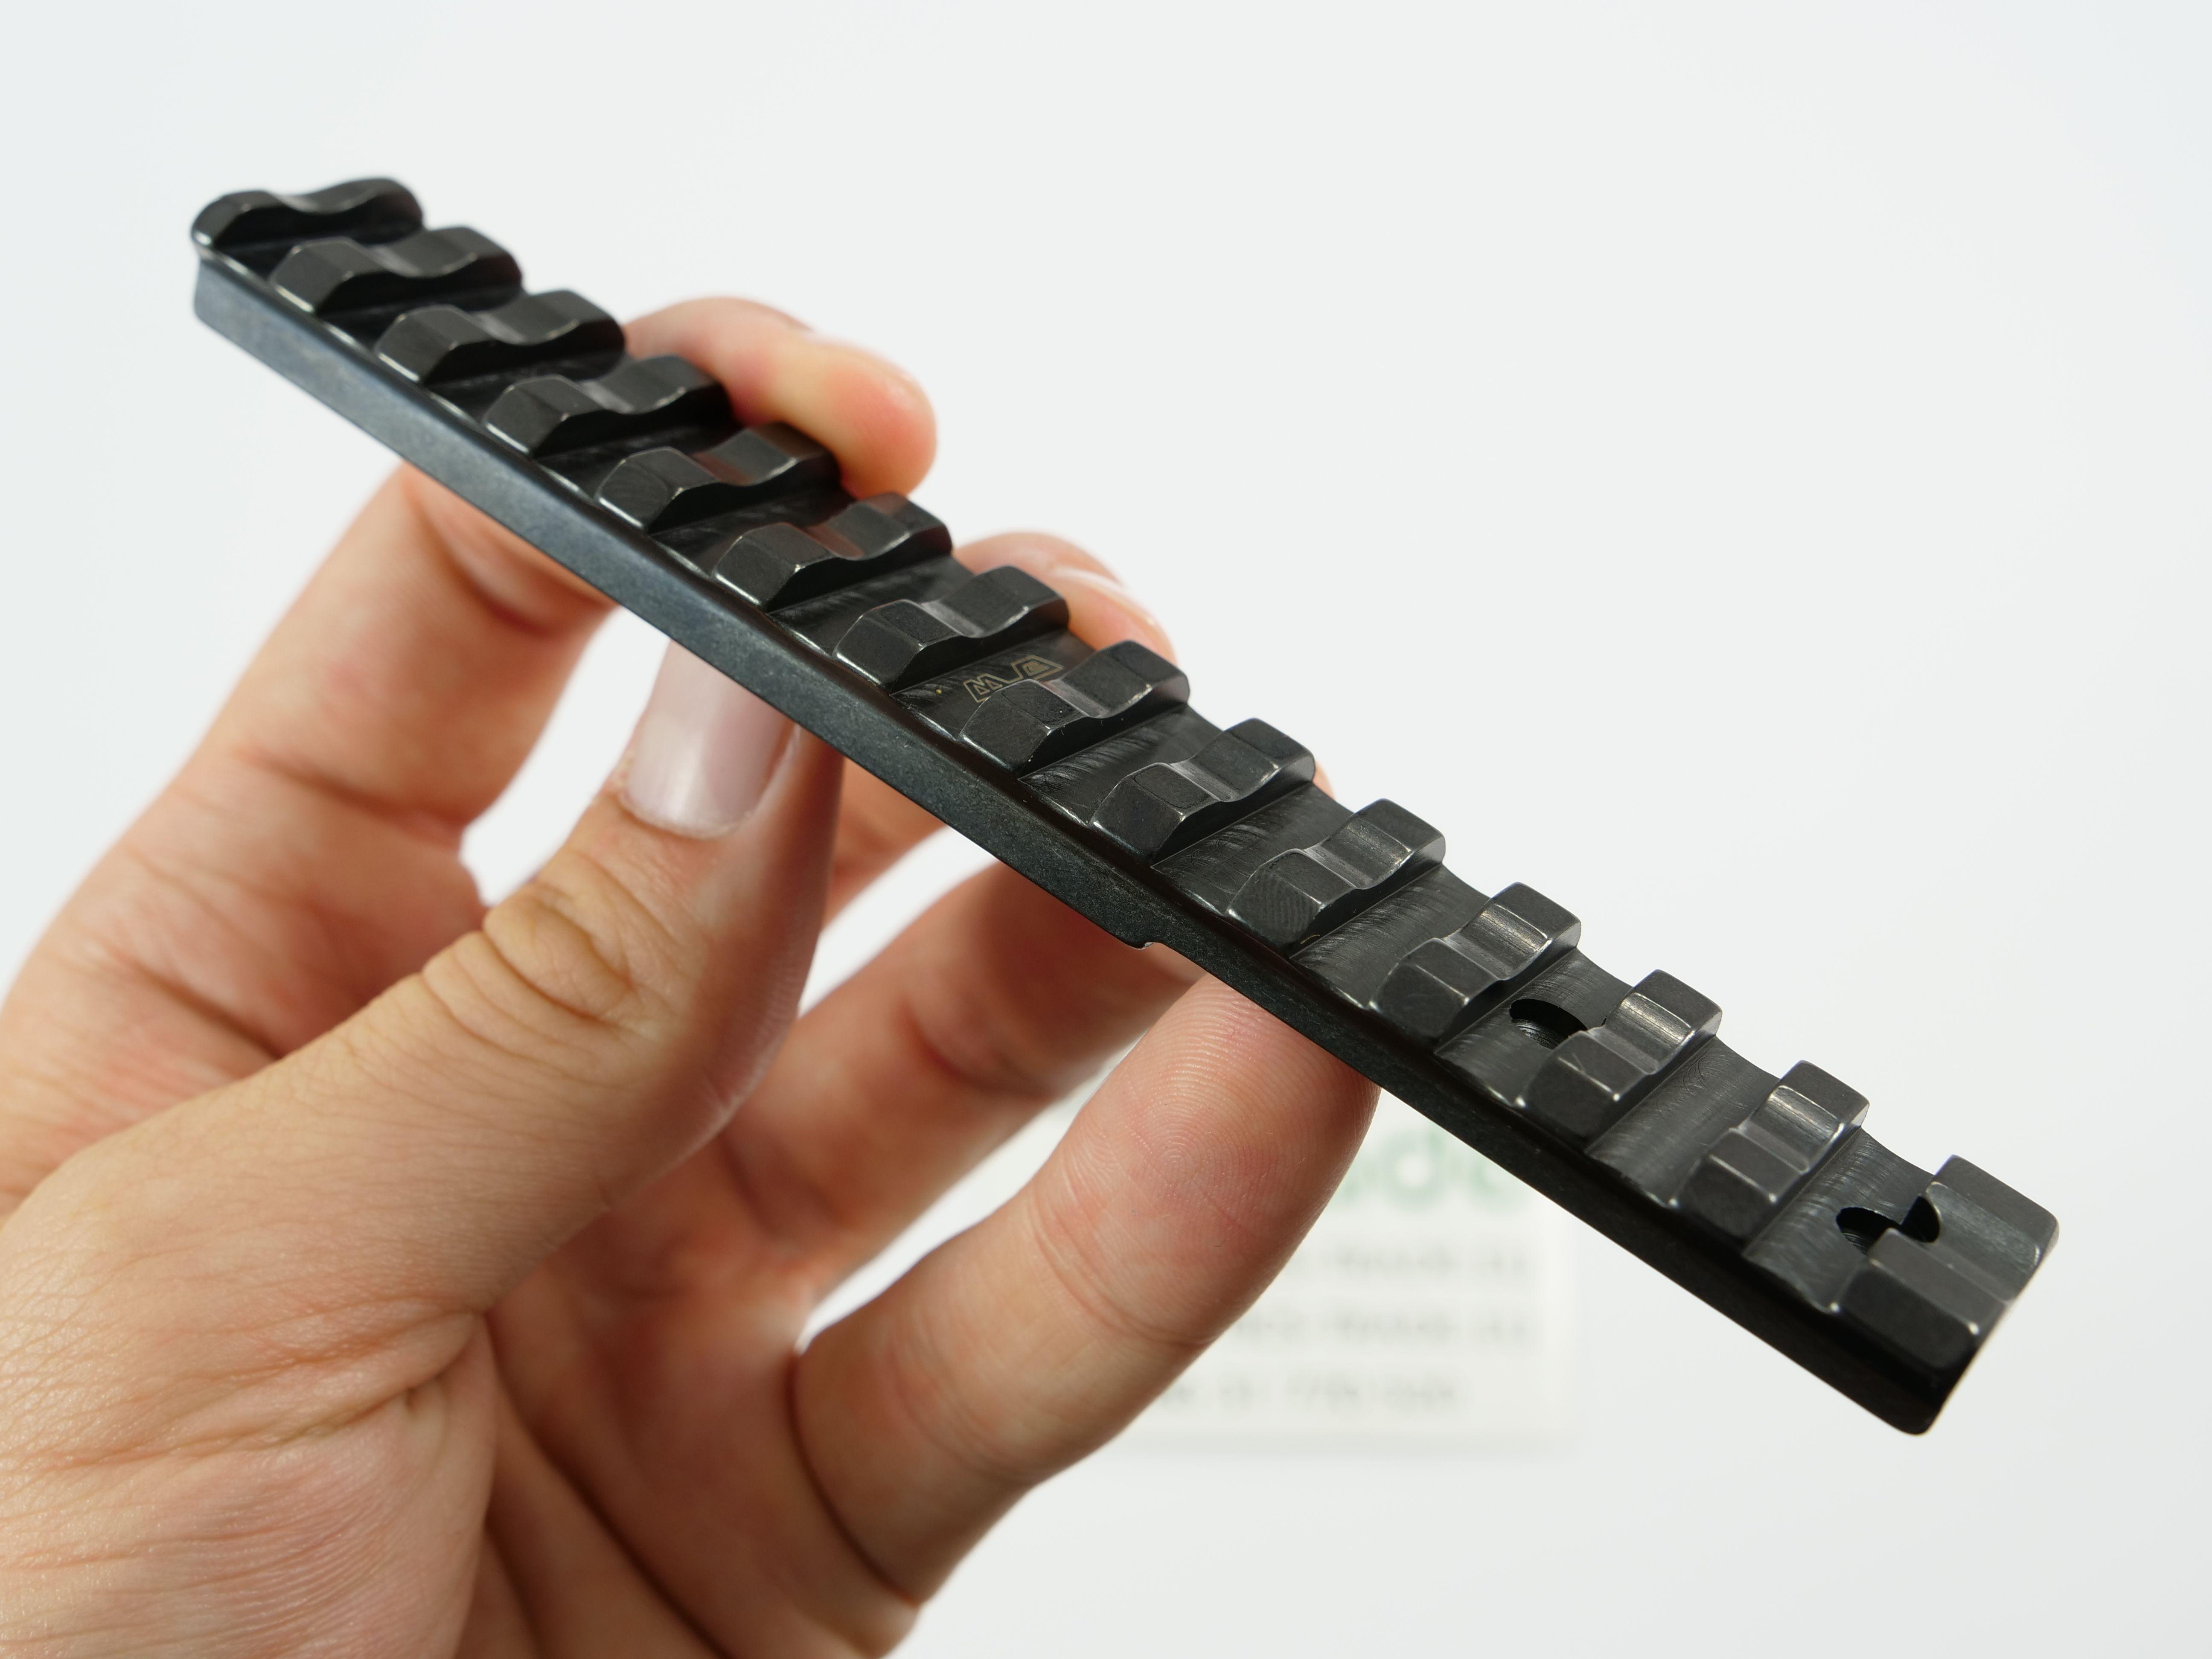 Picatinny rail for SIG Sauer SSG 3000